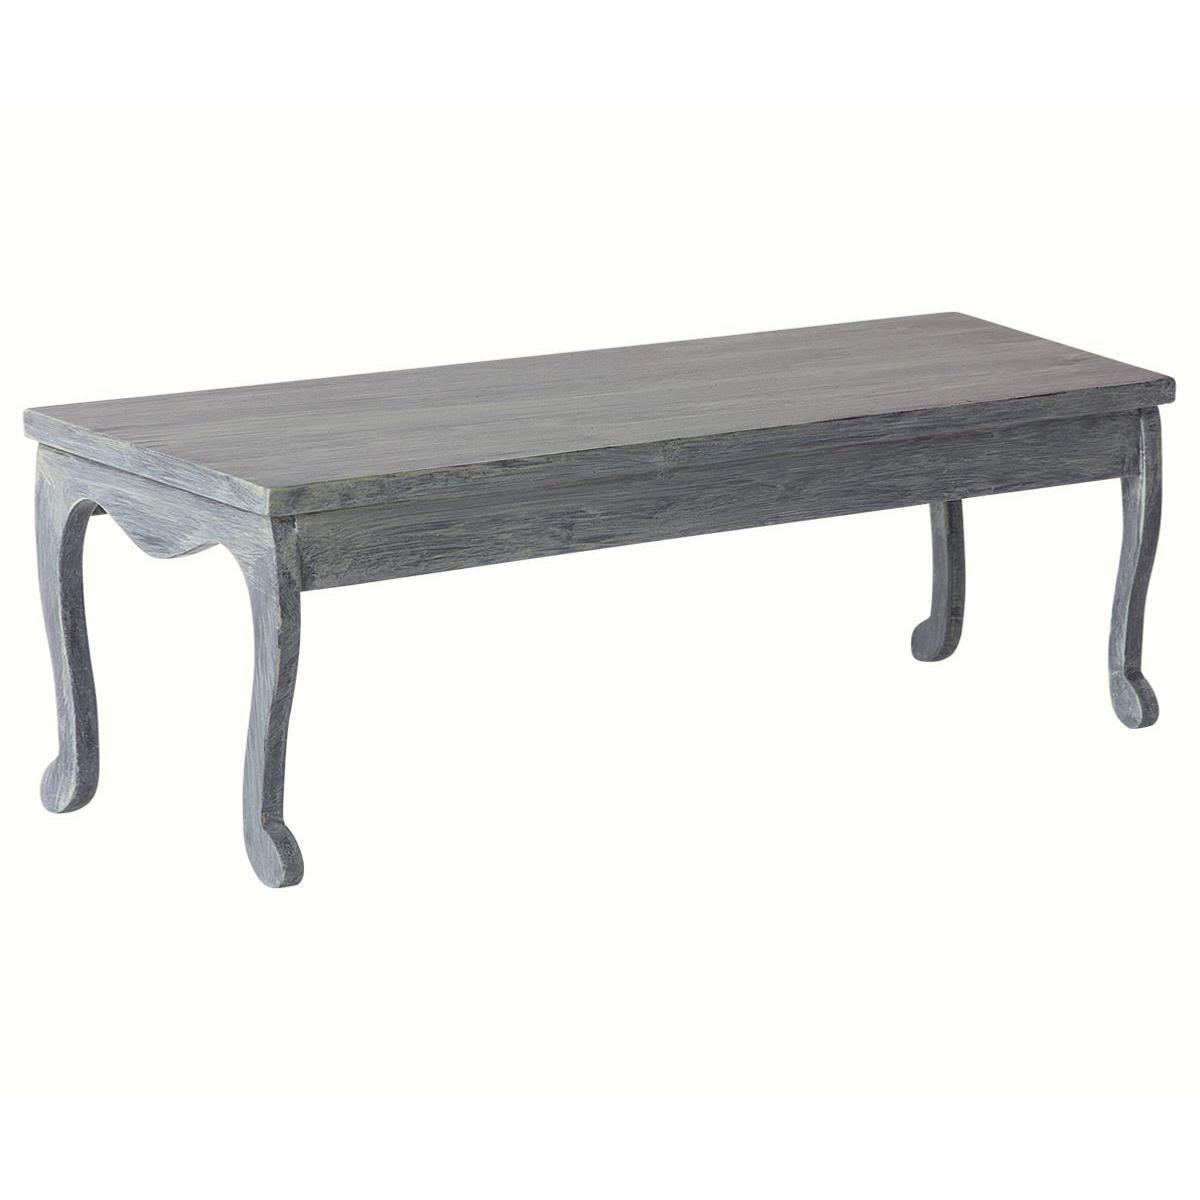 Table vintage bois Maileg